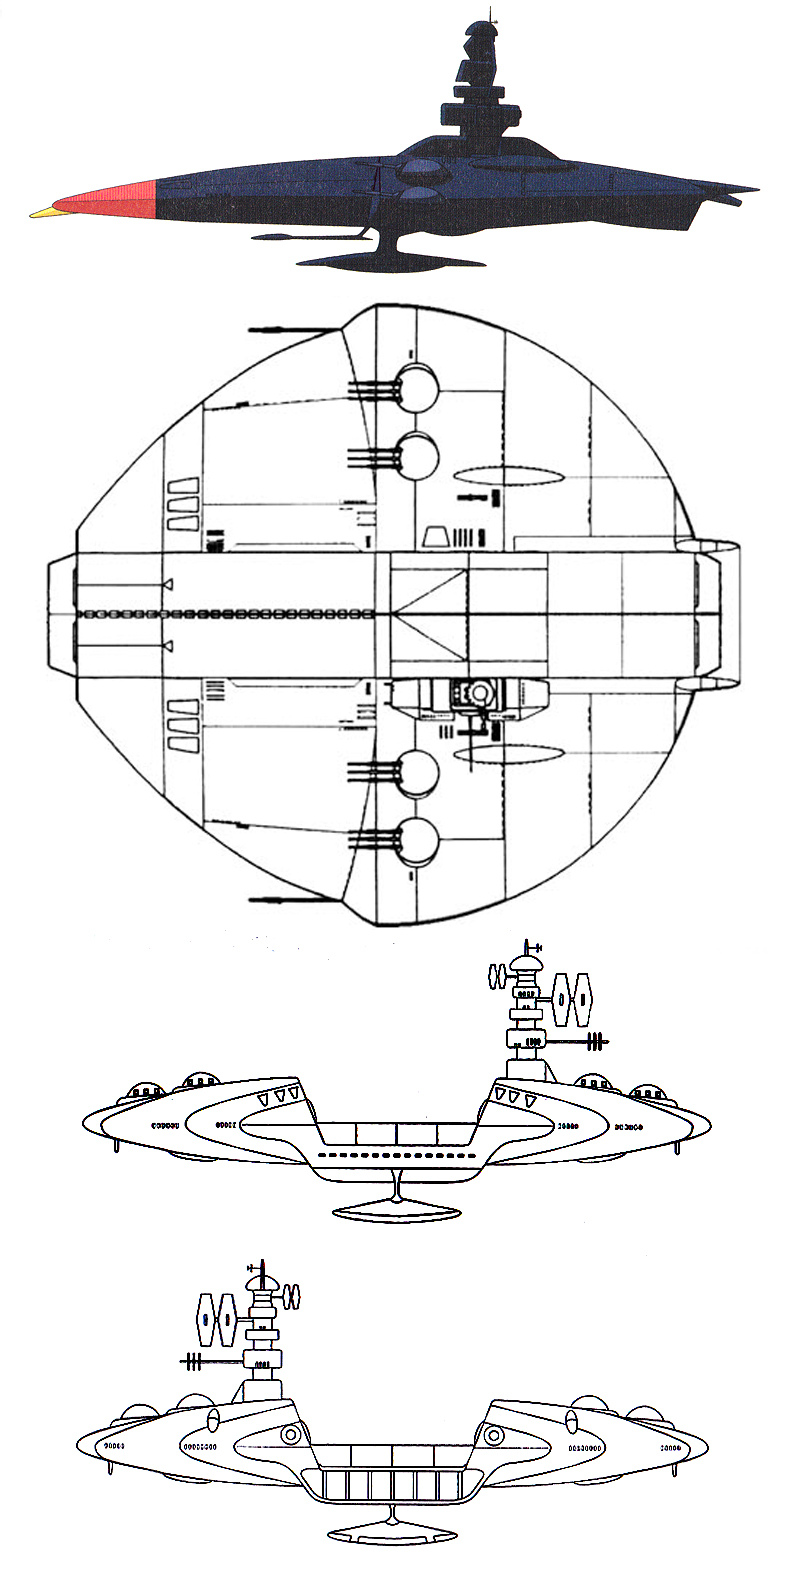 starship schematic database official dark nebula vessels